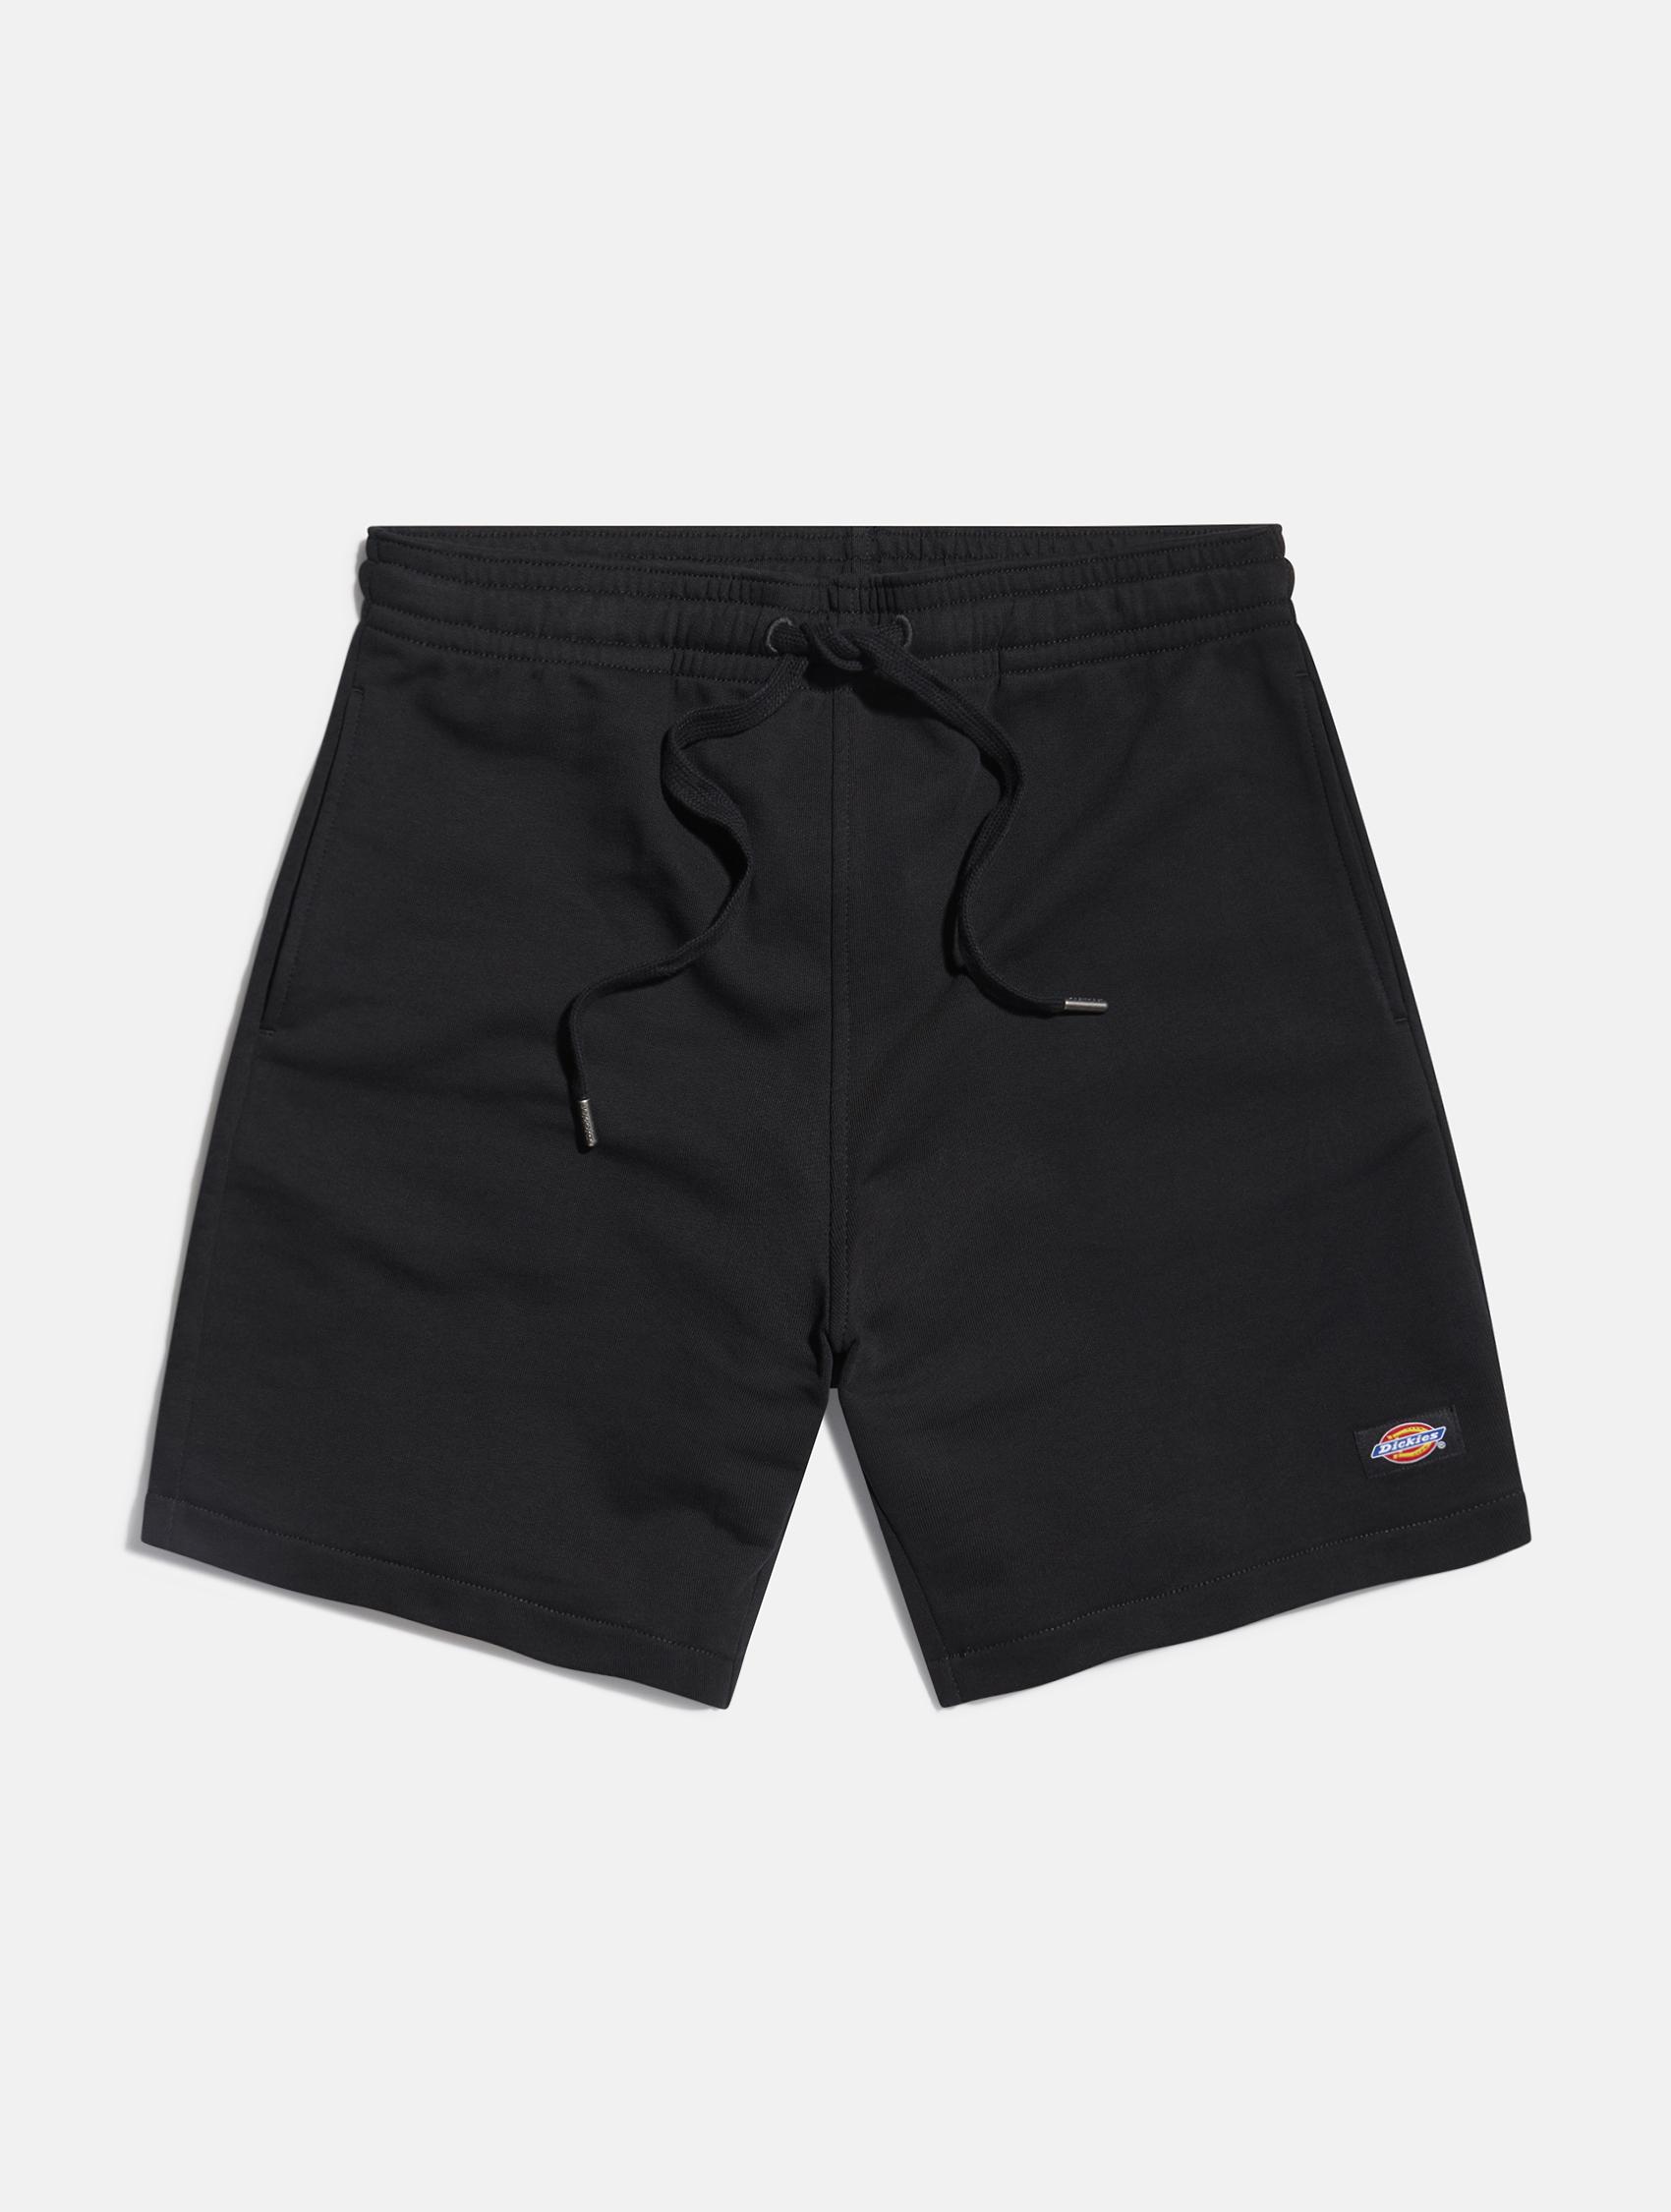 Dickies black swimming shorts   eCommerce Photography London